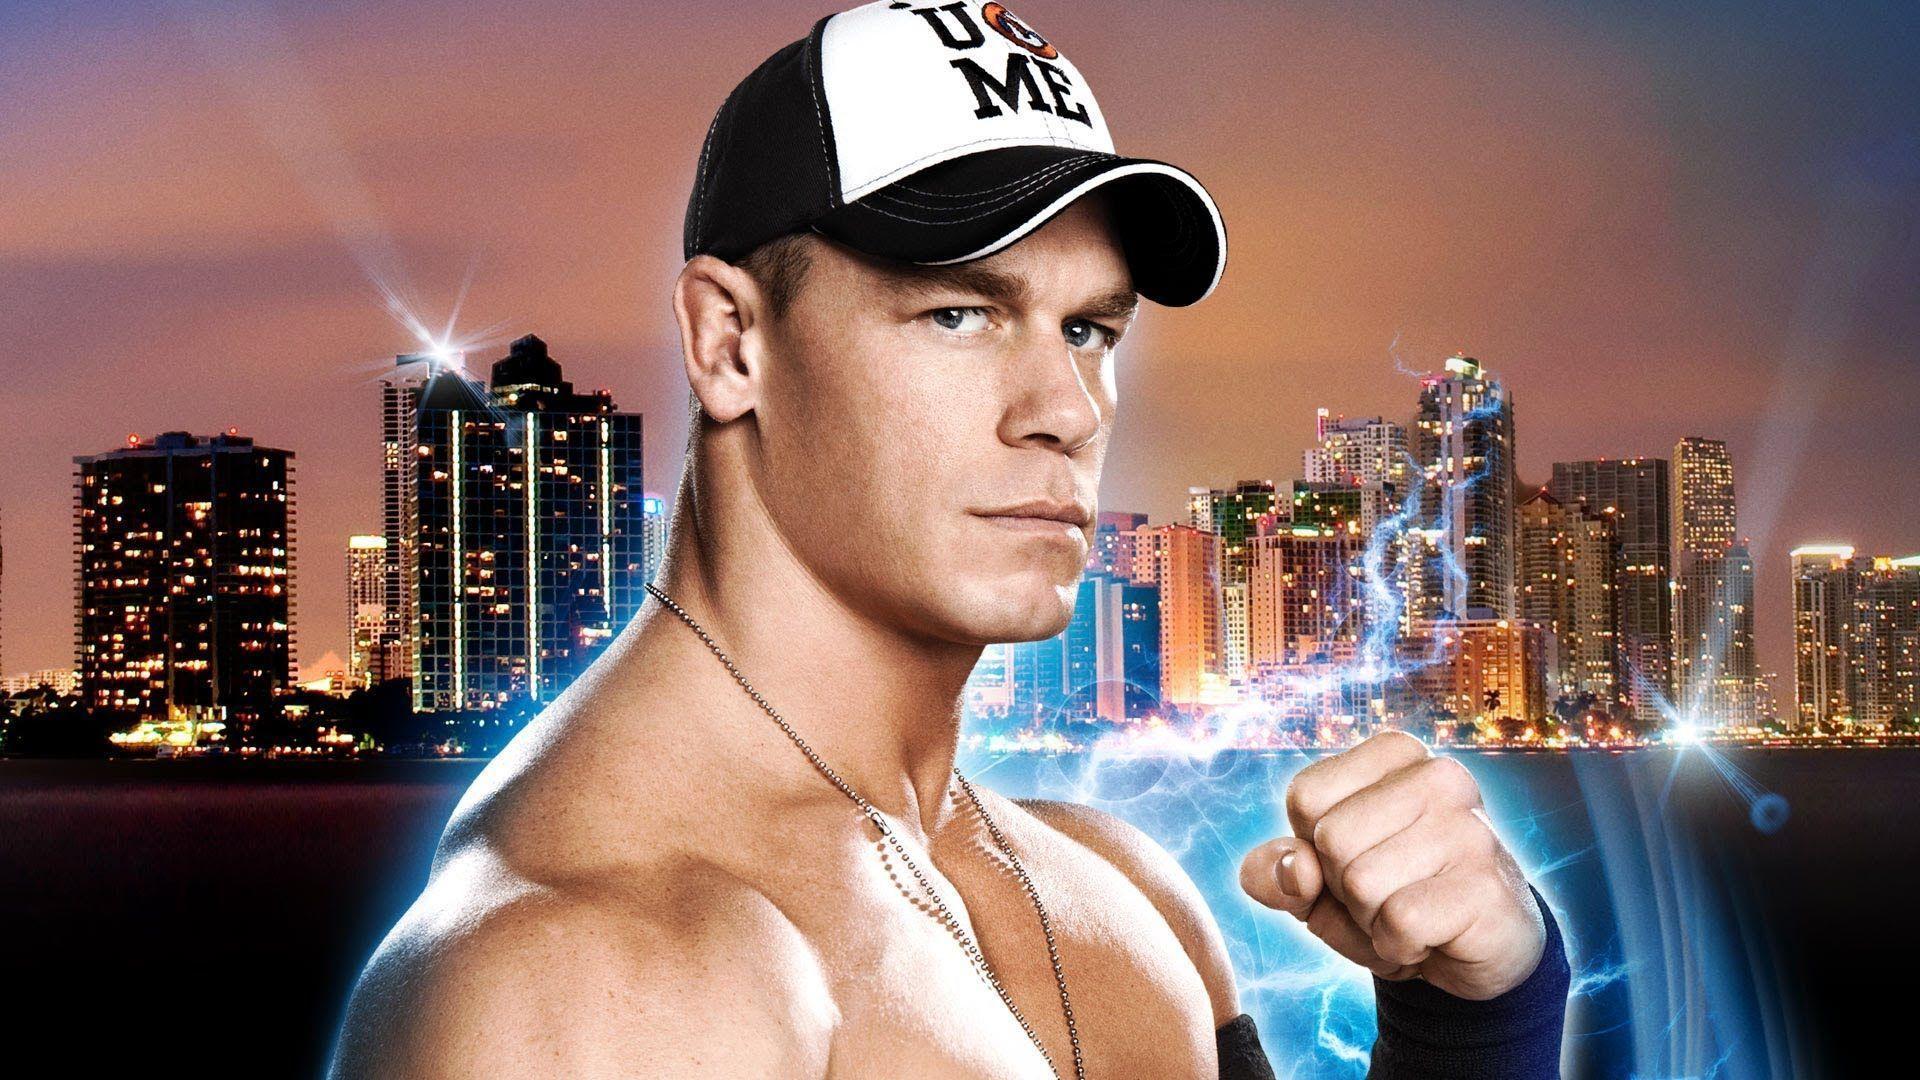 John Cena New HD Wallpapers